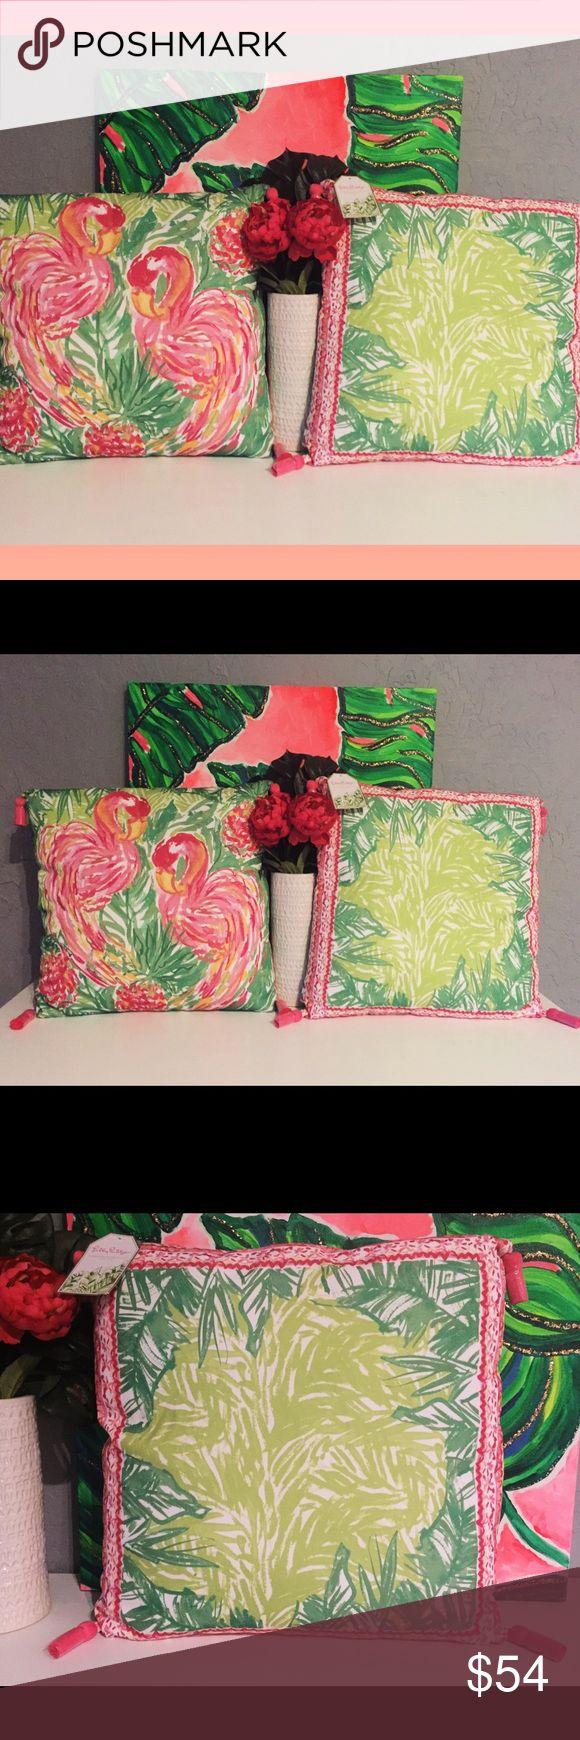 Lilly Pulitzer Pillow XL Flamingo Patio Home Decor